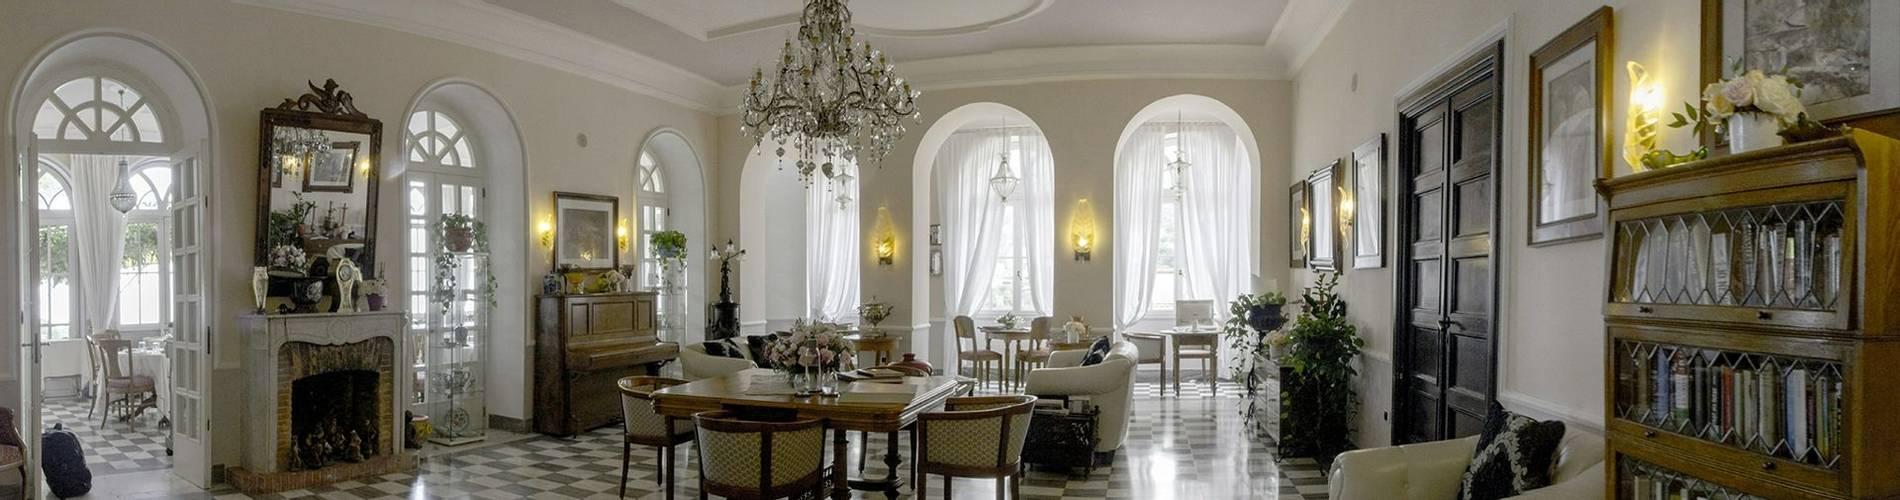 Villa Maria, Amalfi Coast, Italy, Lounge (2).jpg